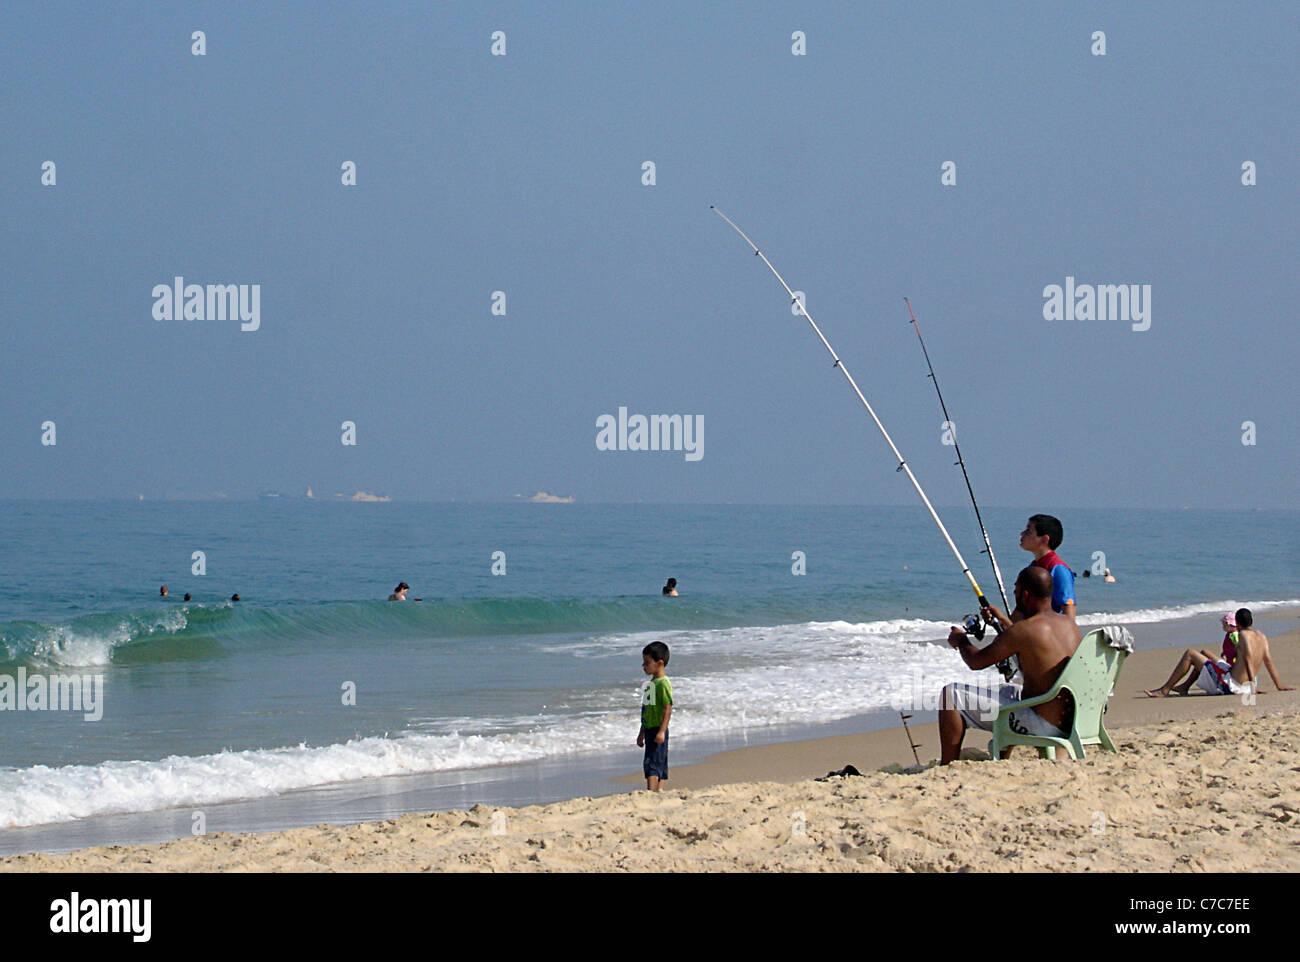 Israel - Nitzanim Beach Stock Photo